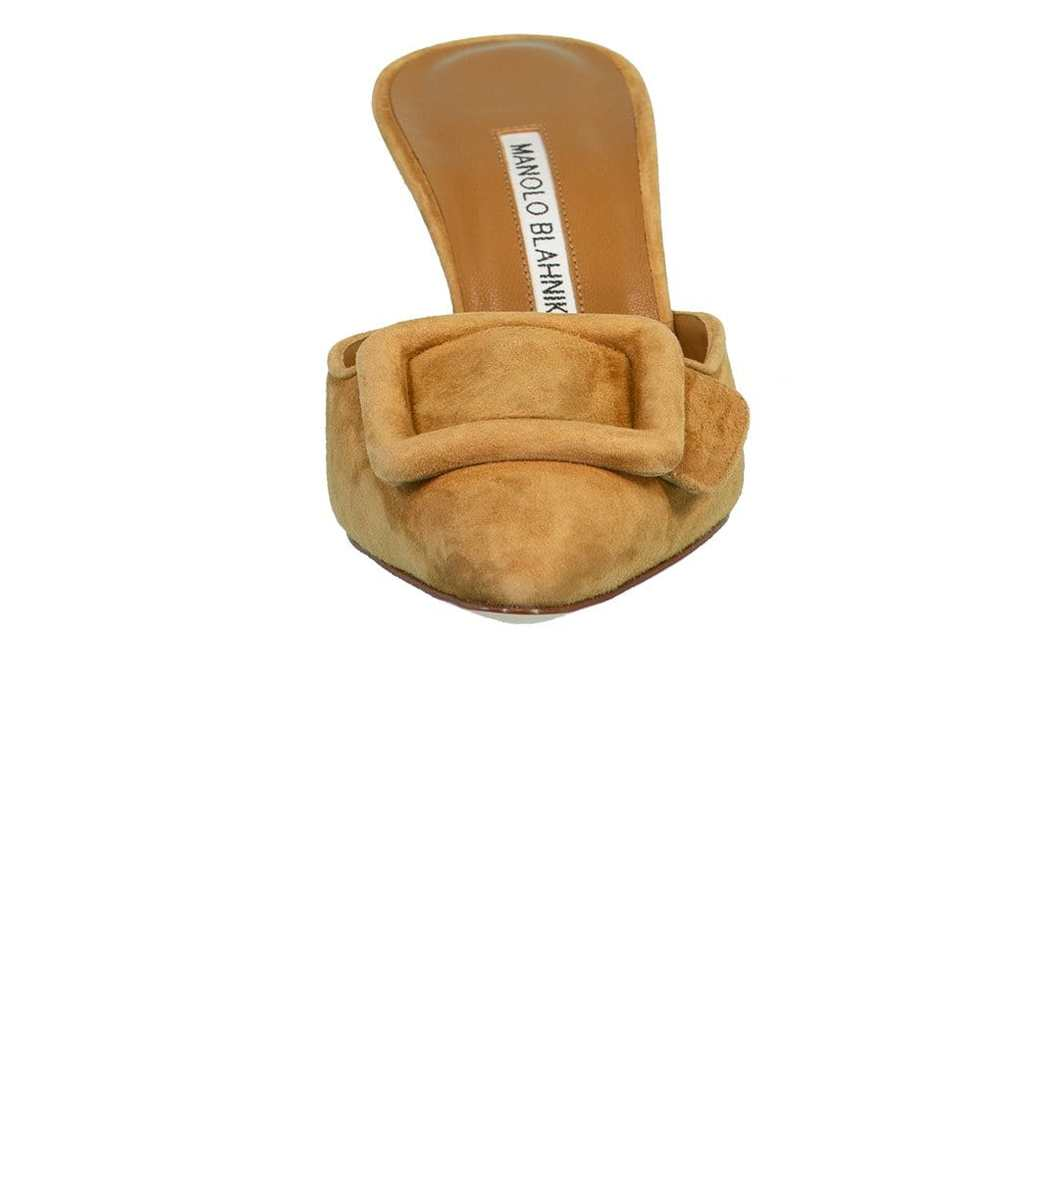 MANOLO BLAHNIK High heels Light Brown Suede Buckle Heel